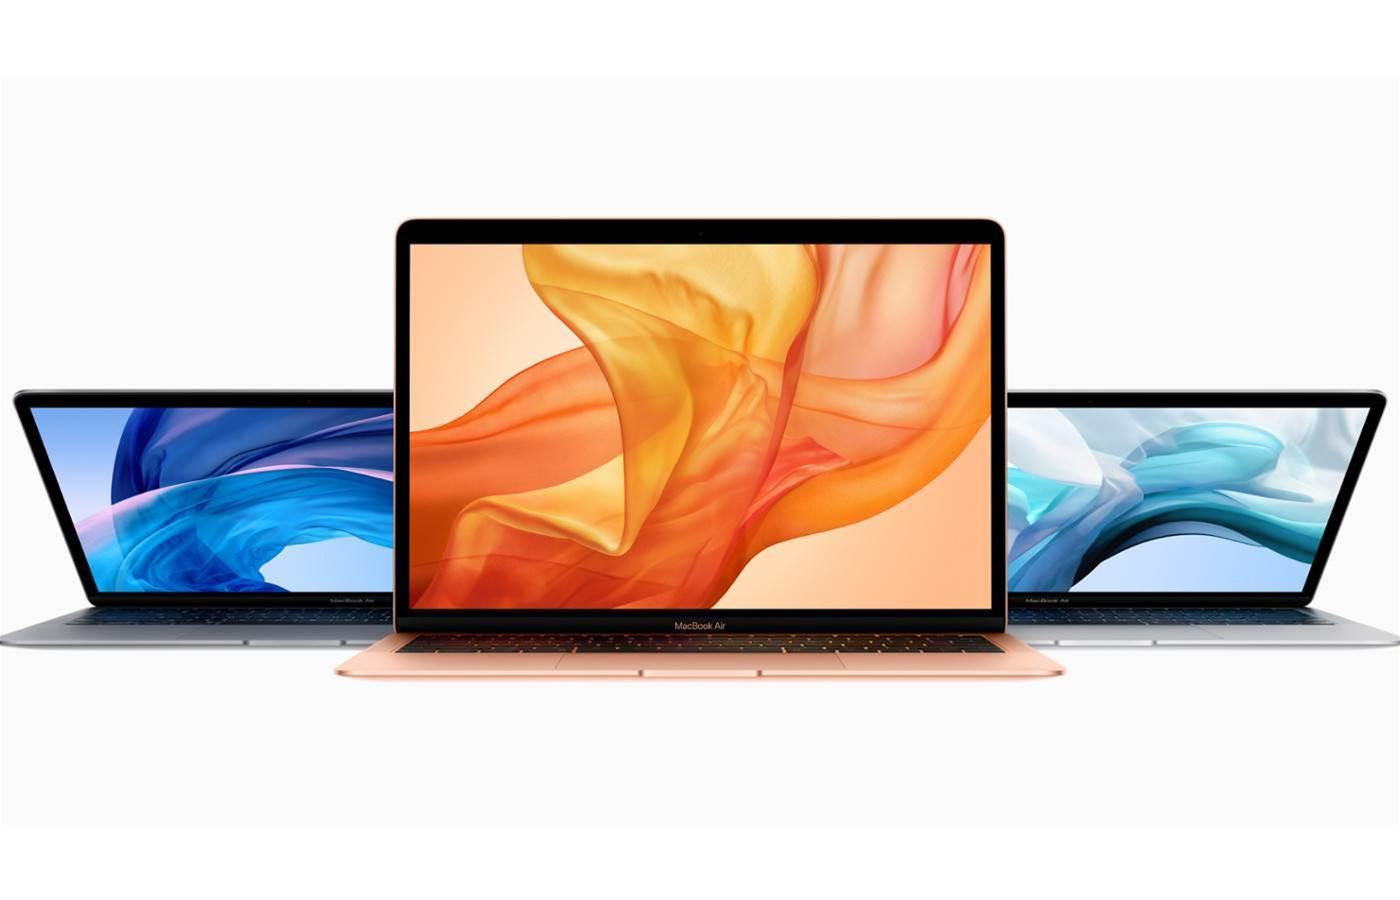 MacBook Air vs MacBook Pro